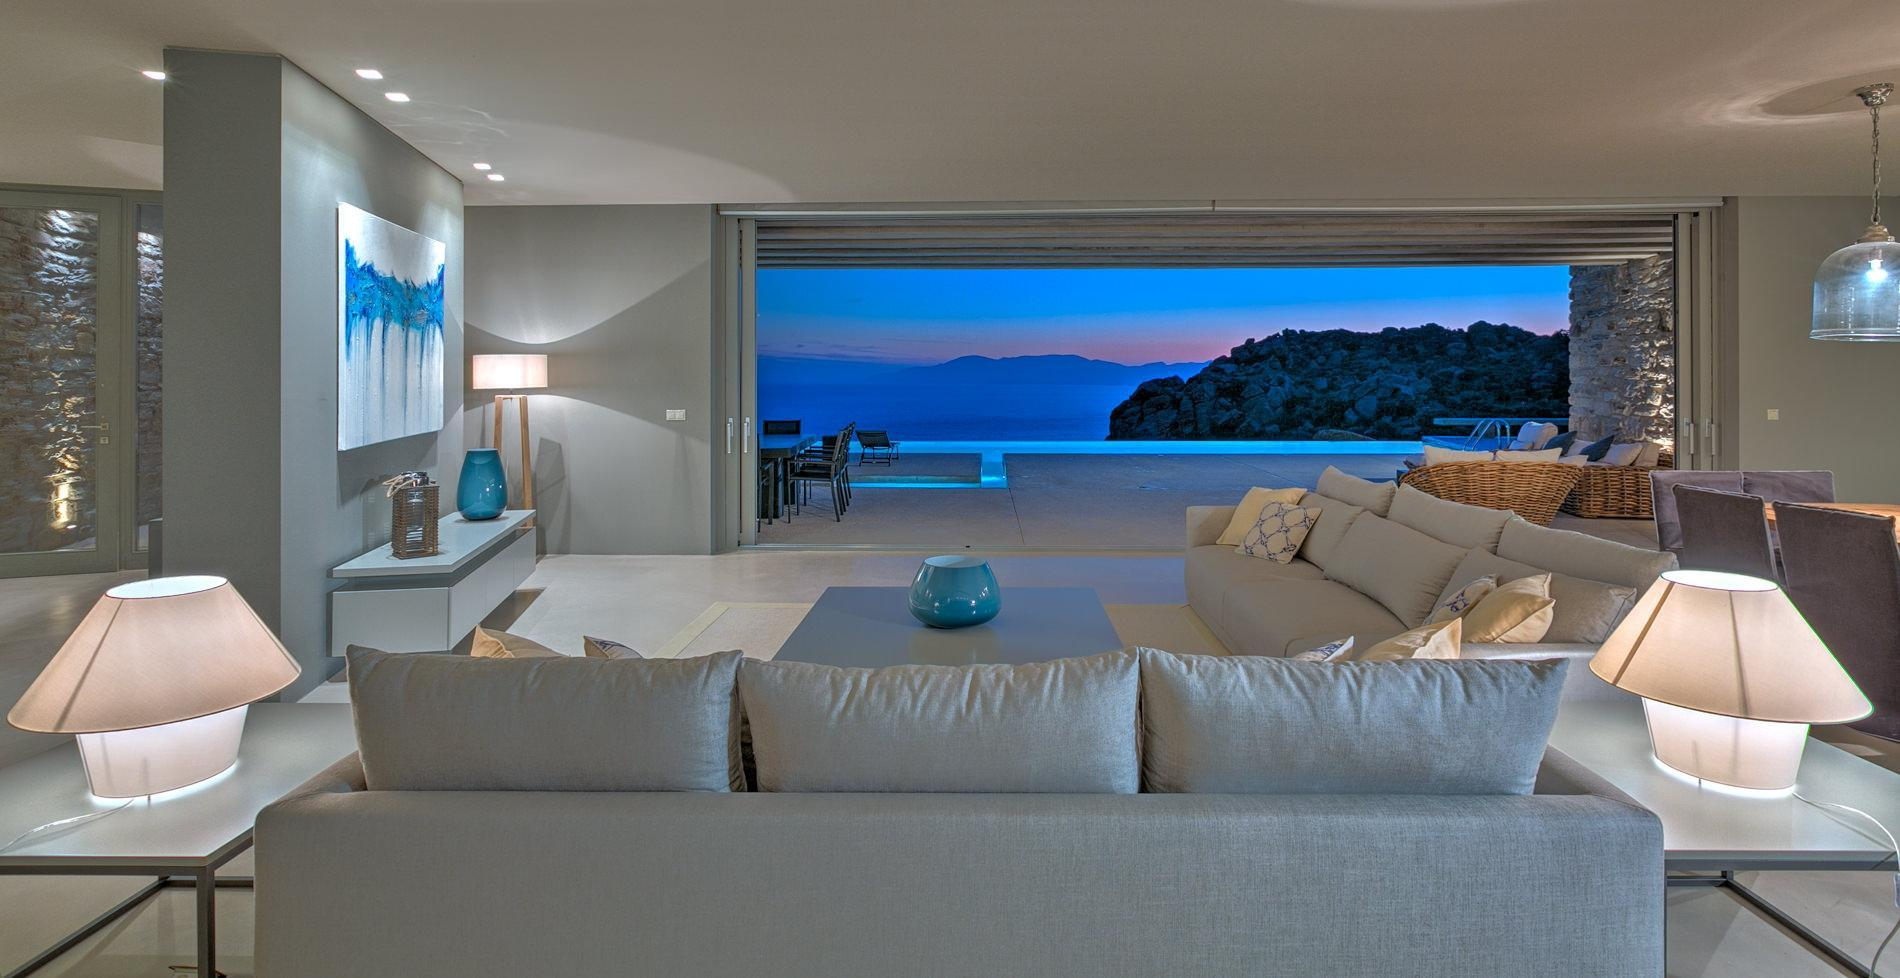 5 Bedrooms Villa Mylo IOS With Amazing Beach View